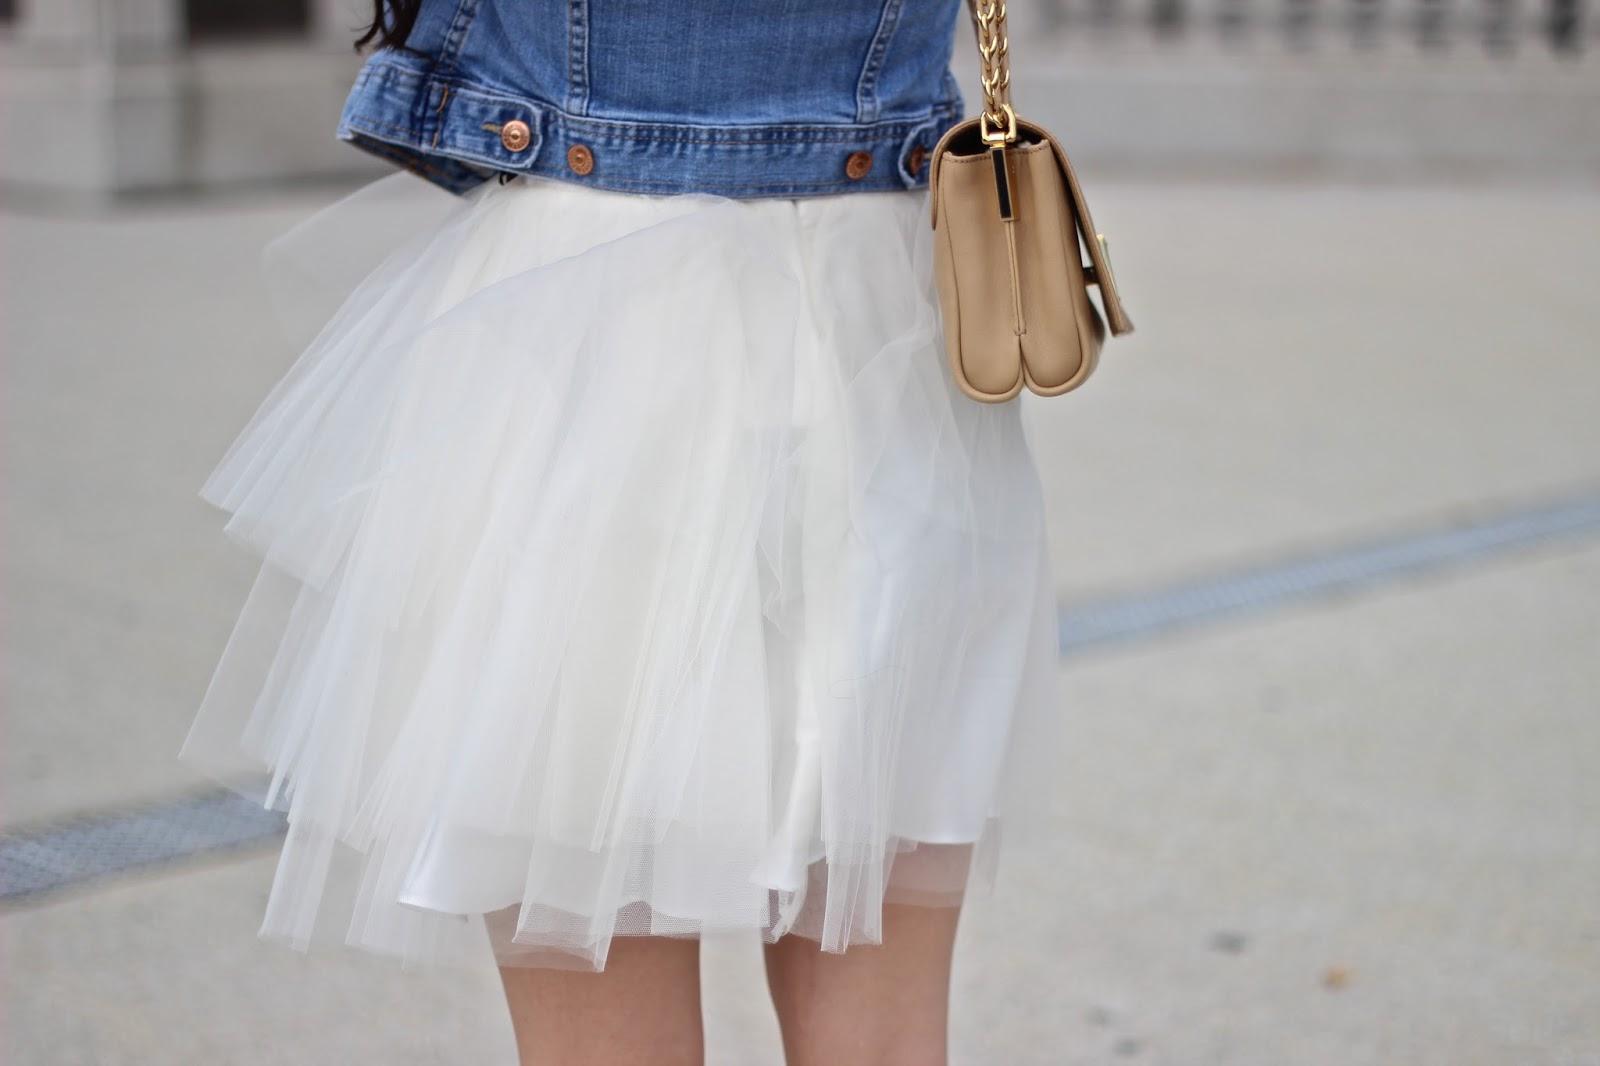 Tulle skirts, tutu skirts, fashion blogger, melba nguyen, tulle skirt pairing, fendi purse